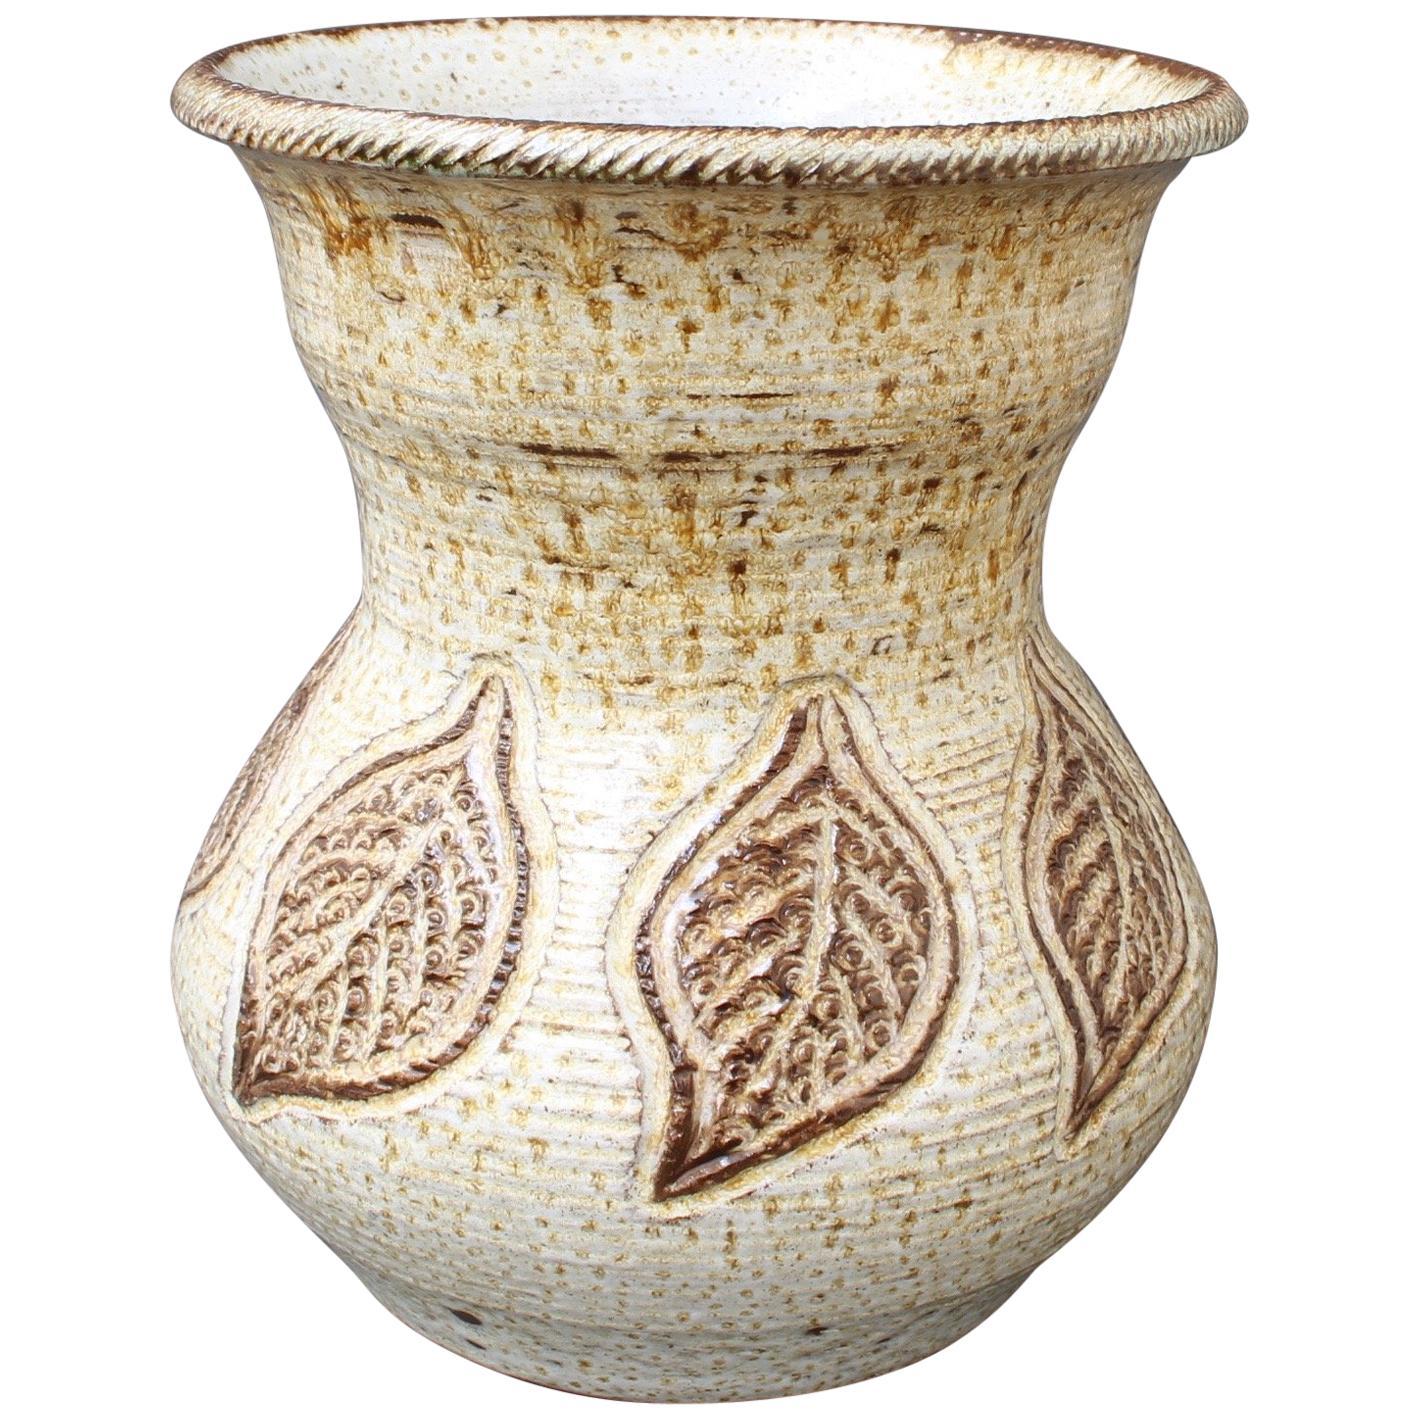 Midcentury Ceramic Vase by Marcel Giraud, Vallauris, 'circa 1960s'